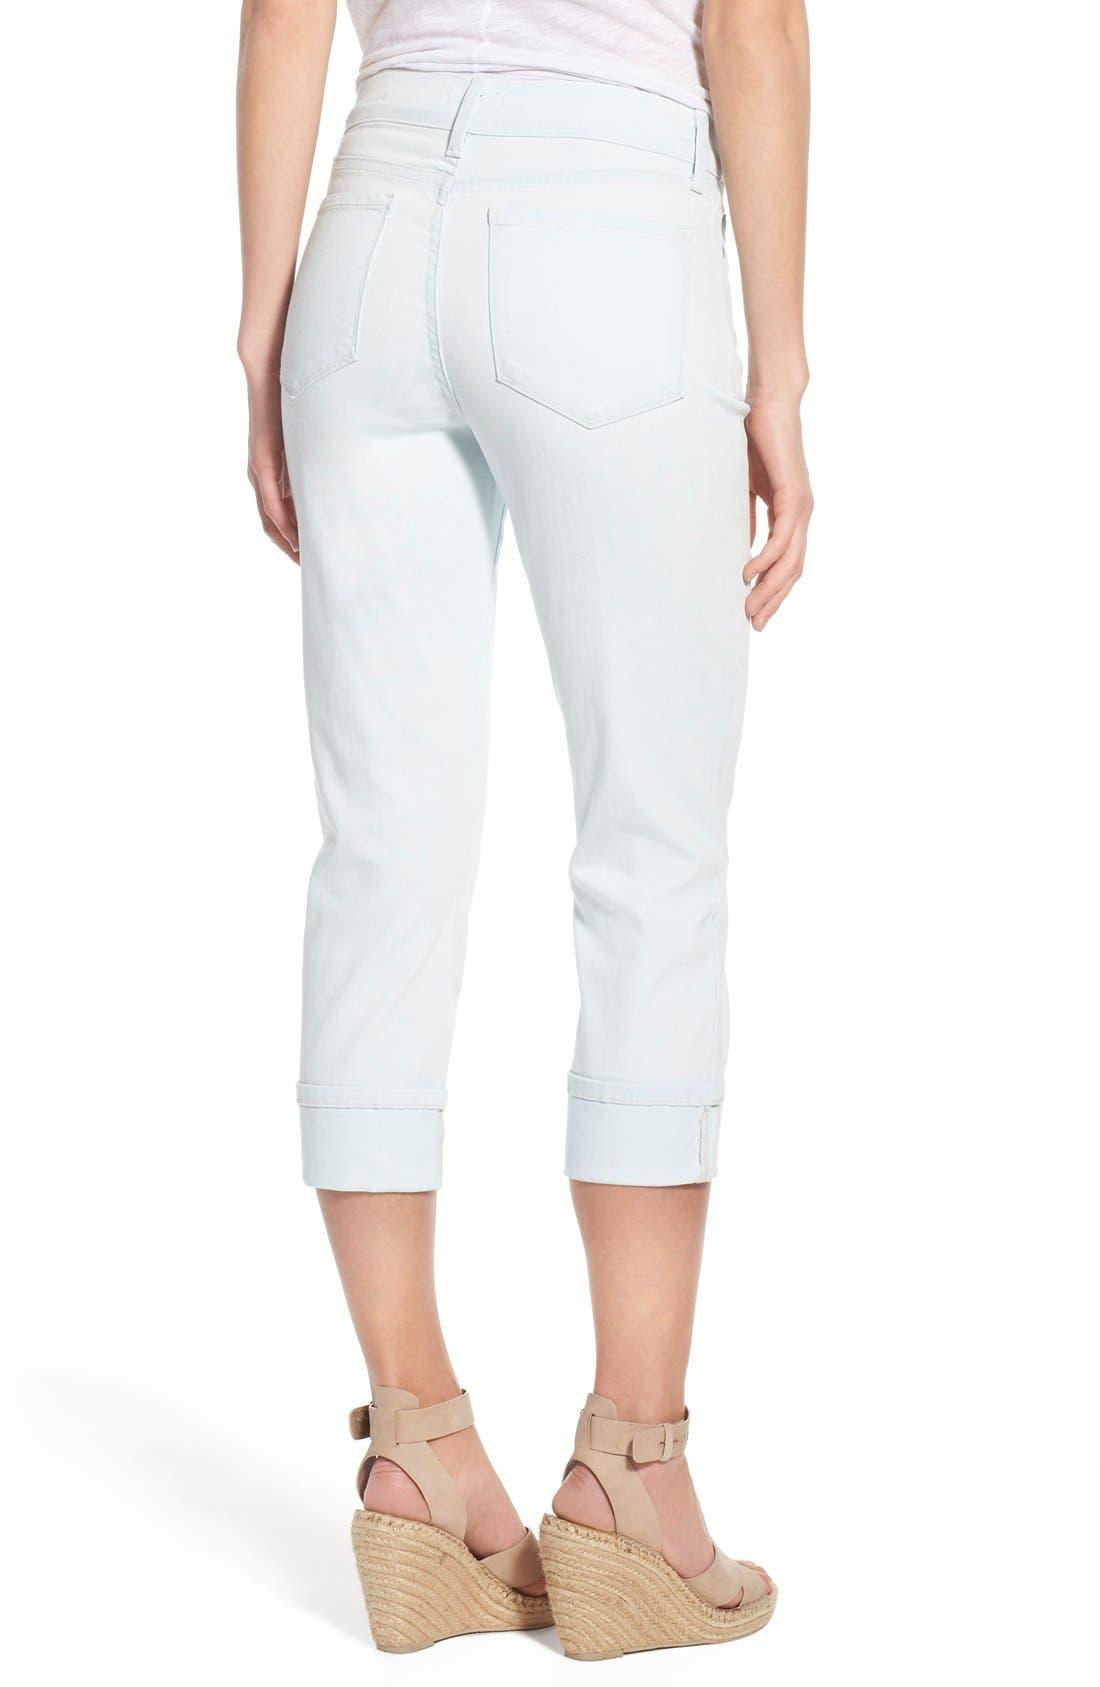 'Dayla' Colored Wide Cuff Capri Jeans,                             Alternate thumbnail 41, color,